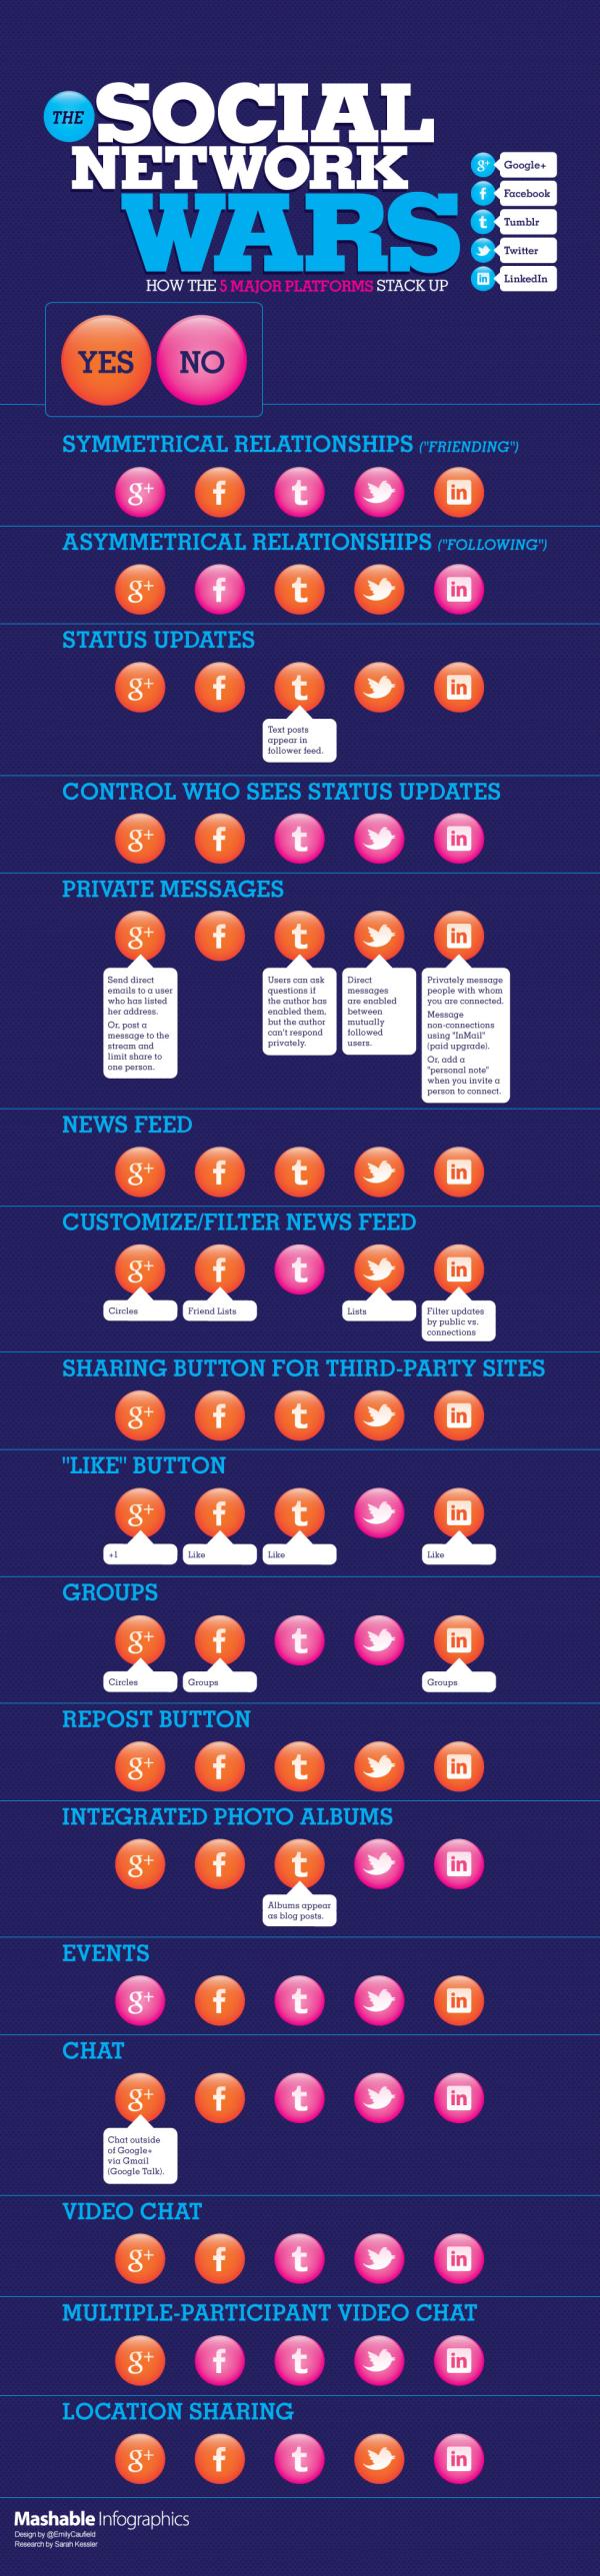 social network comparison mashable infographics resized 600